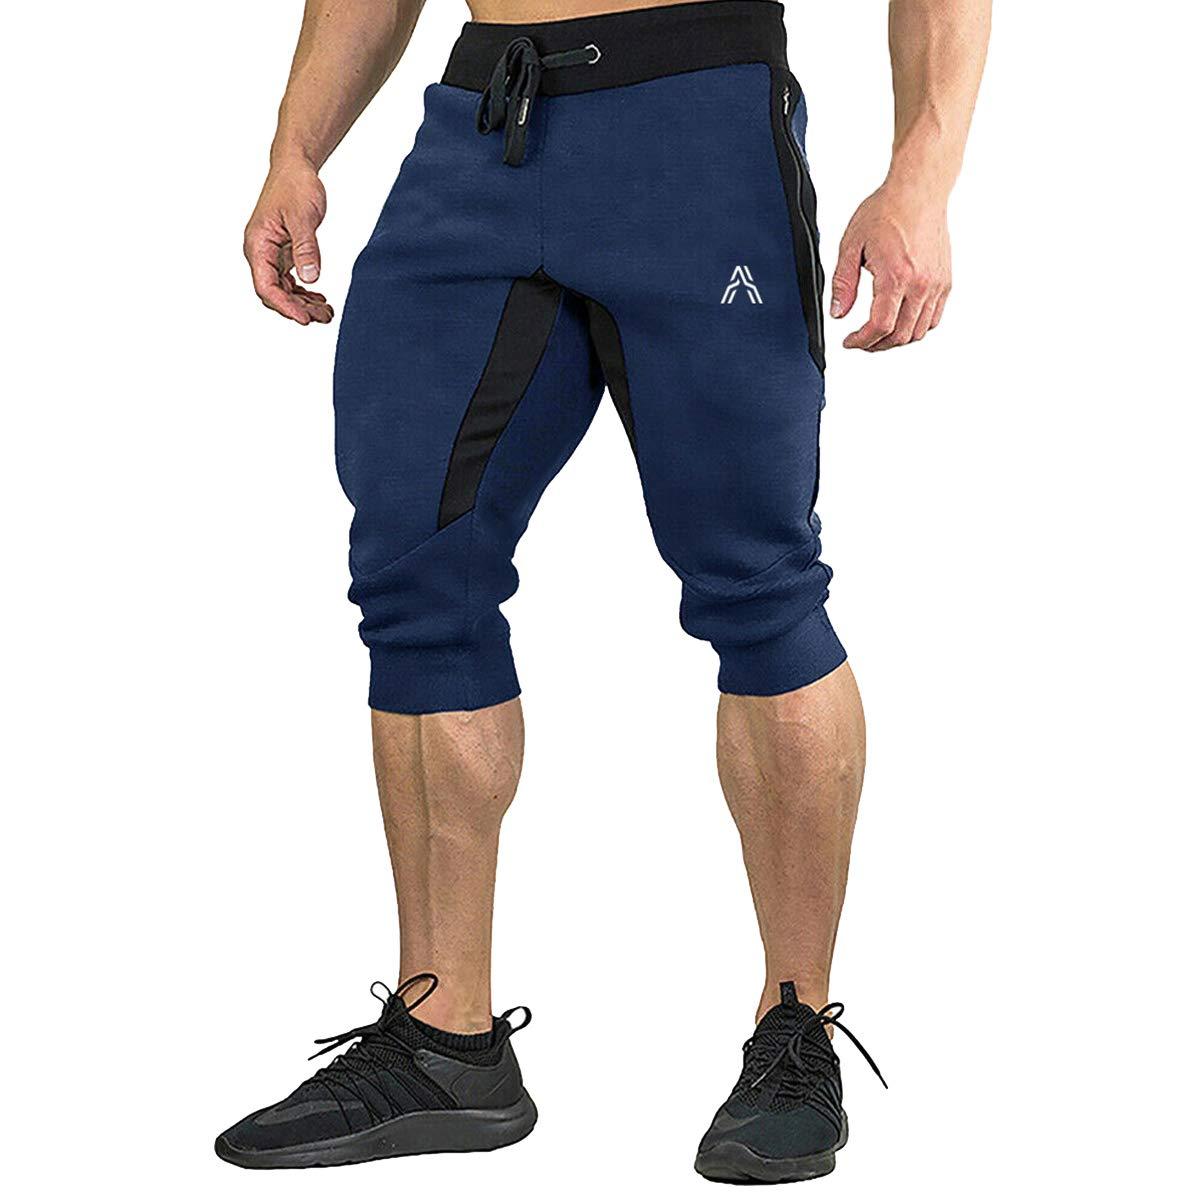 MAGCOMSEN Mens Joggers Sweatpants with 4 Pockets Gym Workout Running Shorts Drawstring Capri Pants